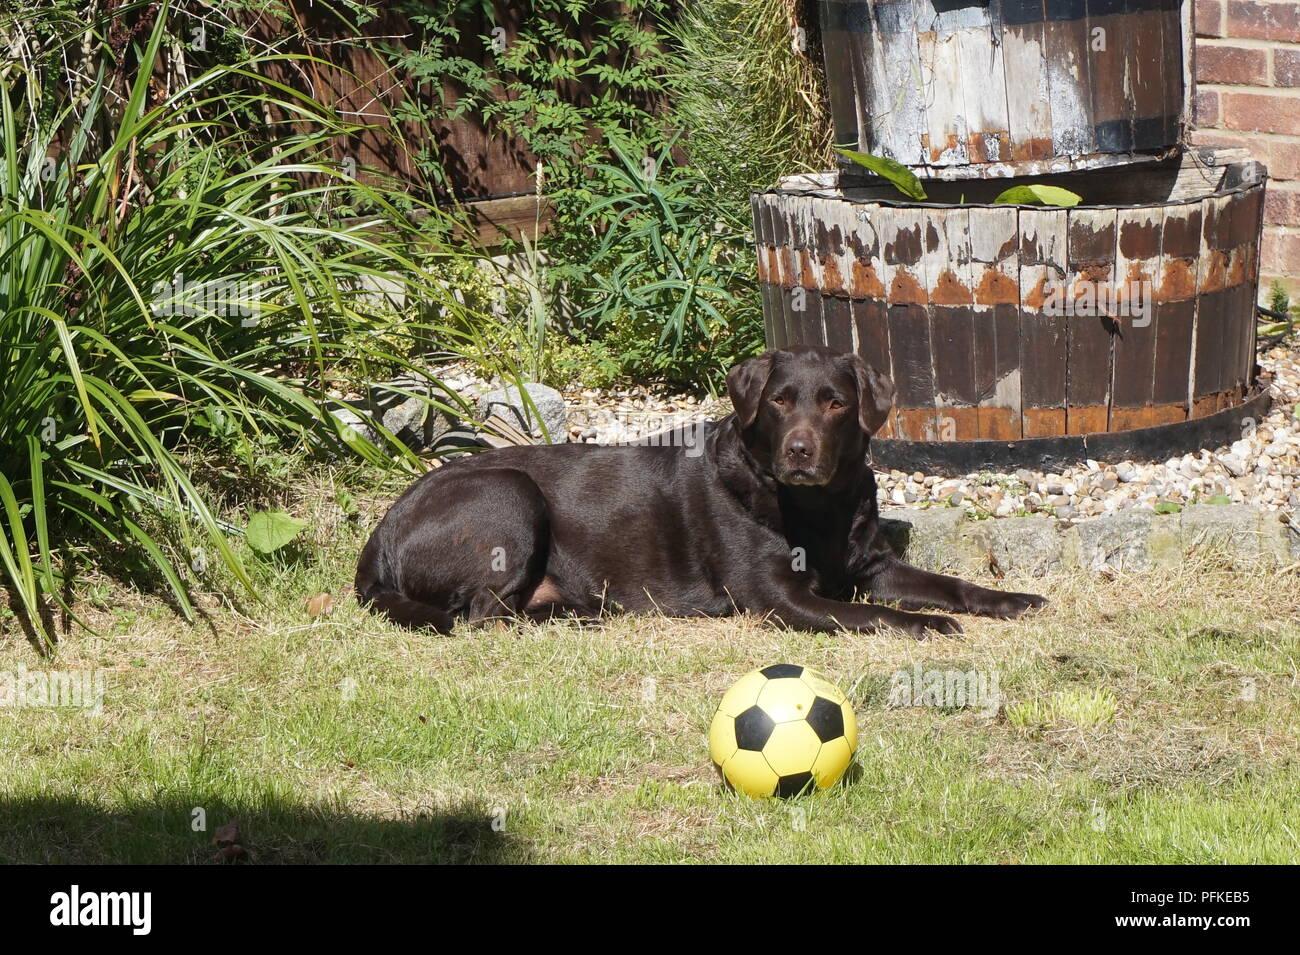 Labrador sunbathing. - Stock Image